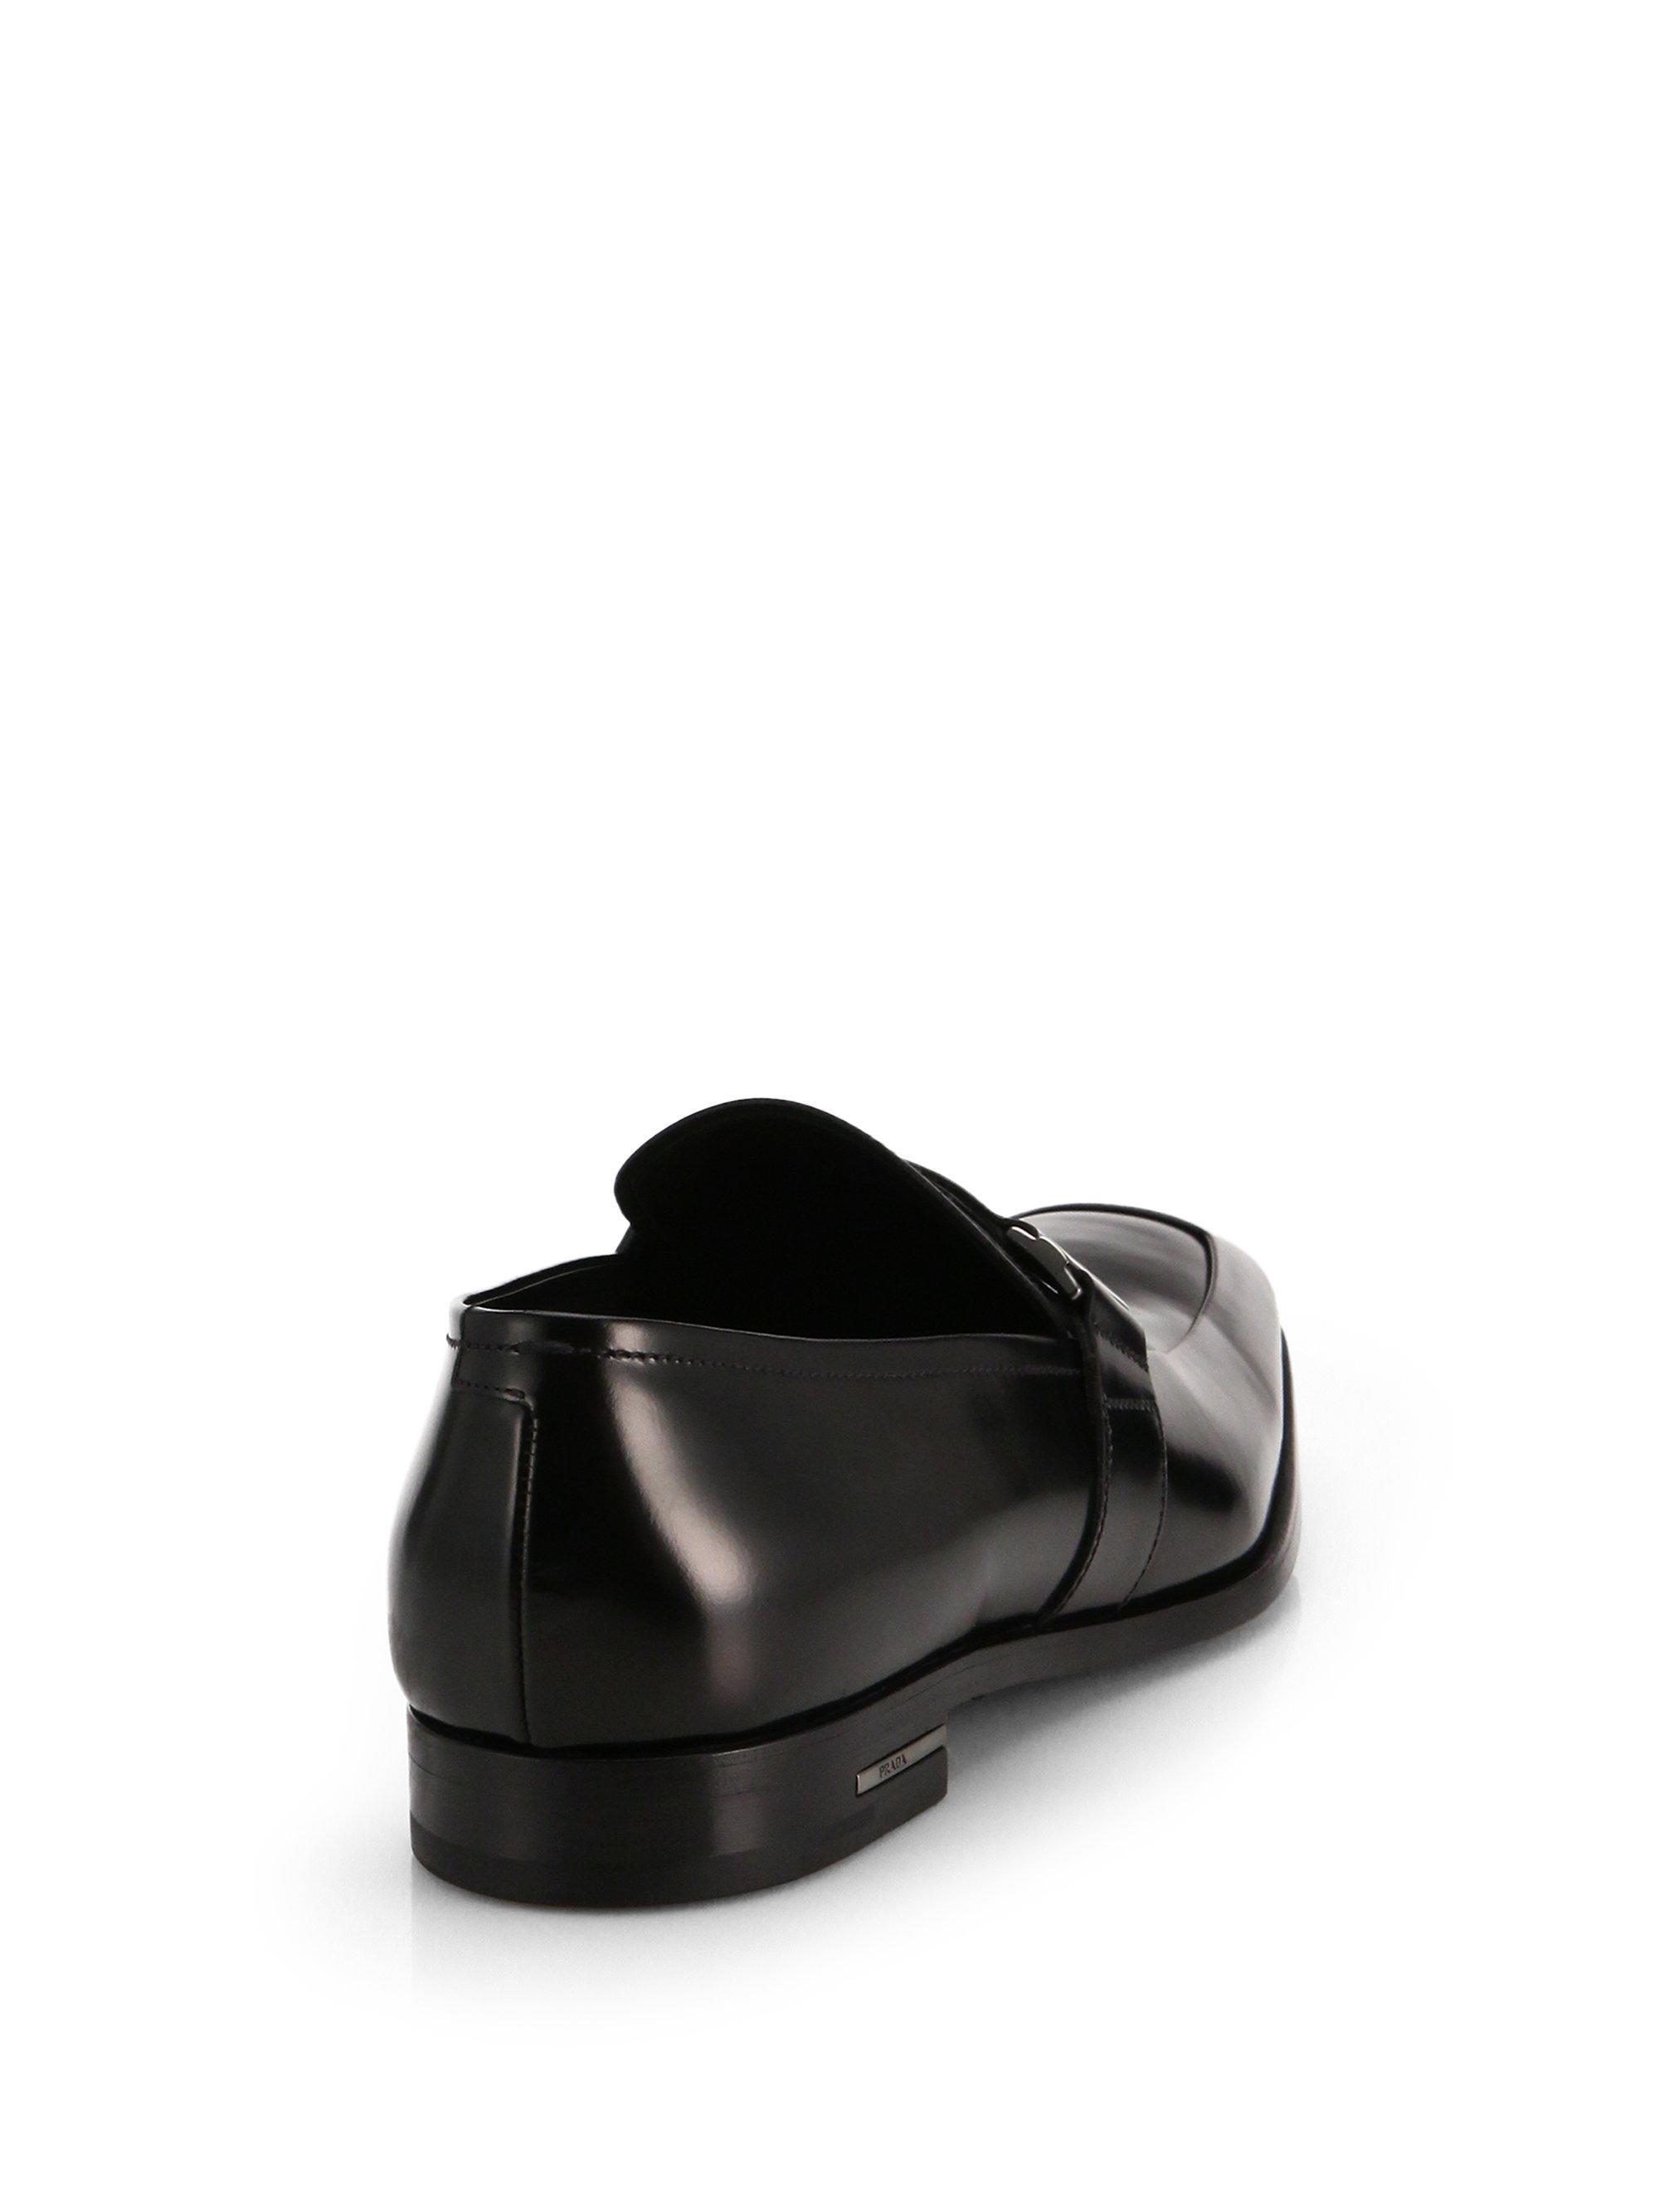 Prada buckle loafers big sale sale online footlocker cheap online Manchester sale online i1RQ4yY